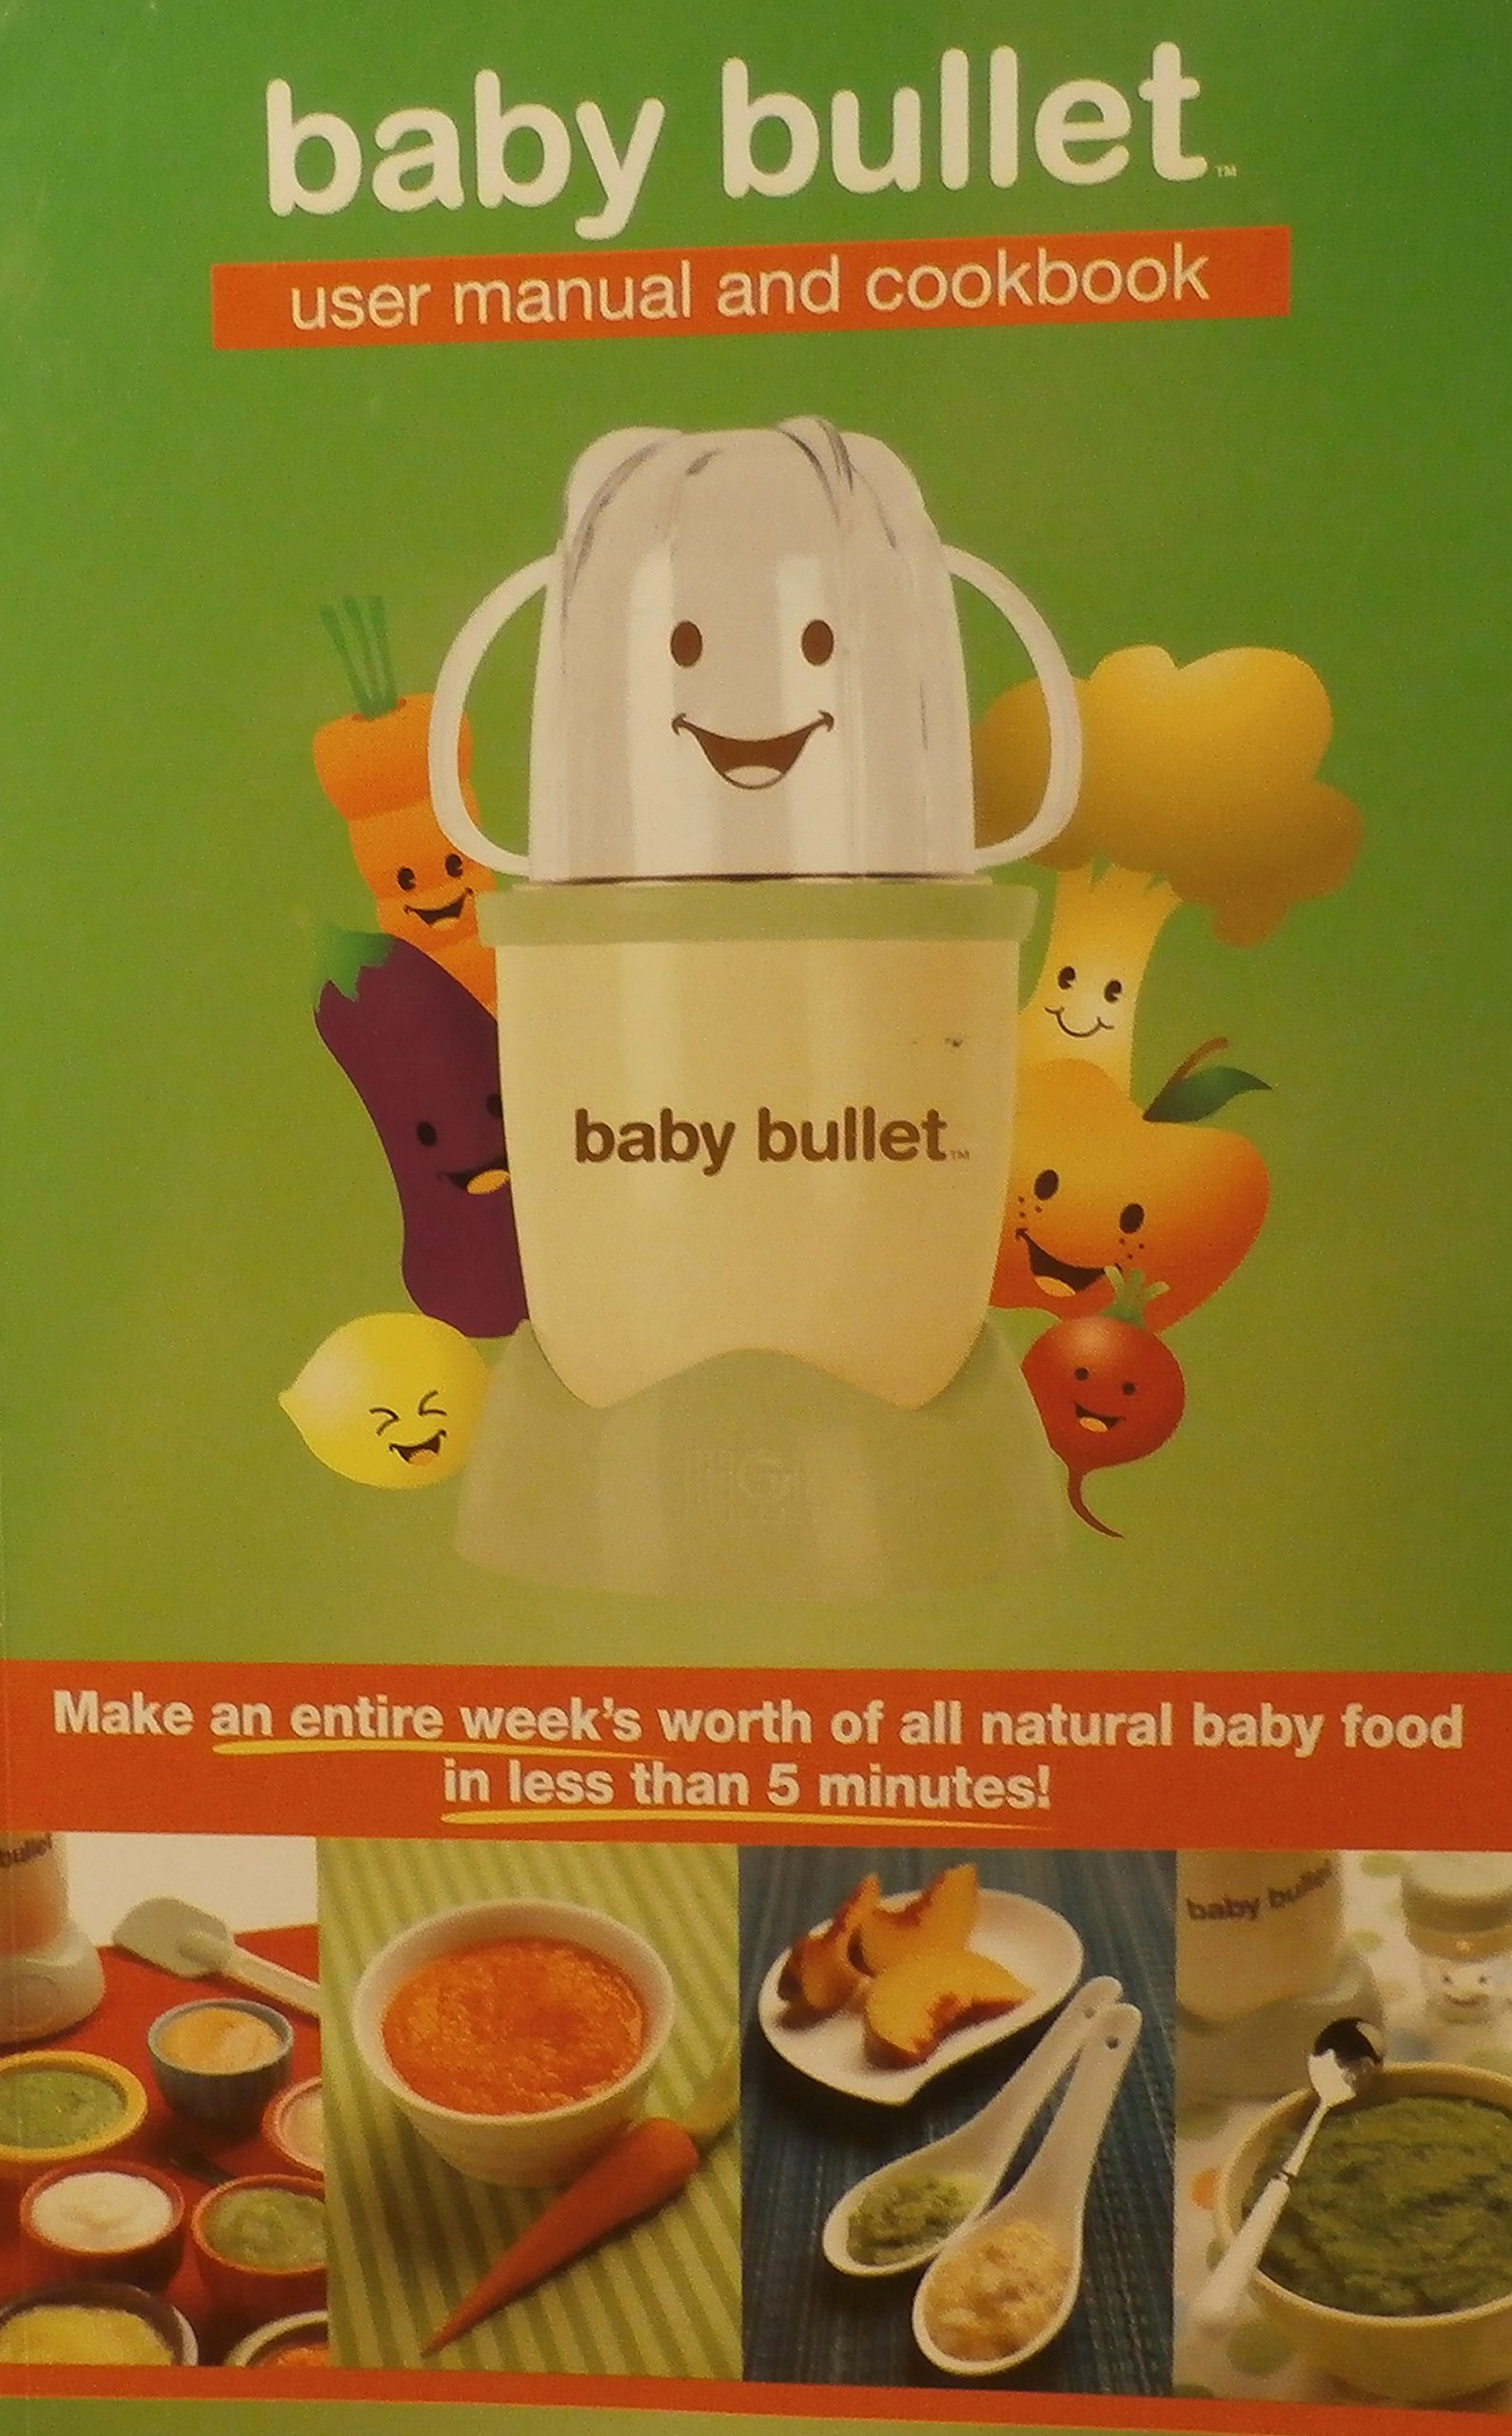 baby bullett user manual and cookbook baby bullet amazon com books rh amazon com Graco Bassinet Instruction Manual baby bullet user manual and cookbook pdf